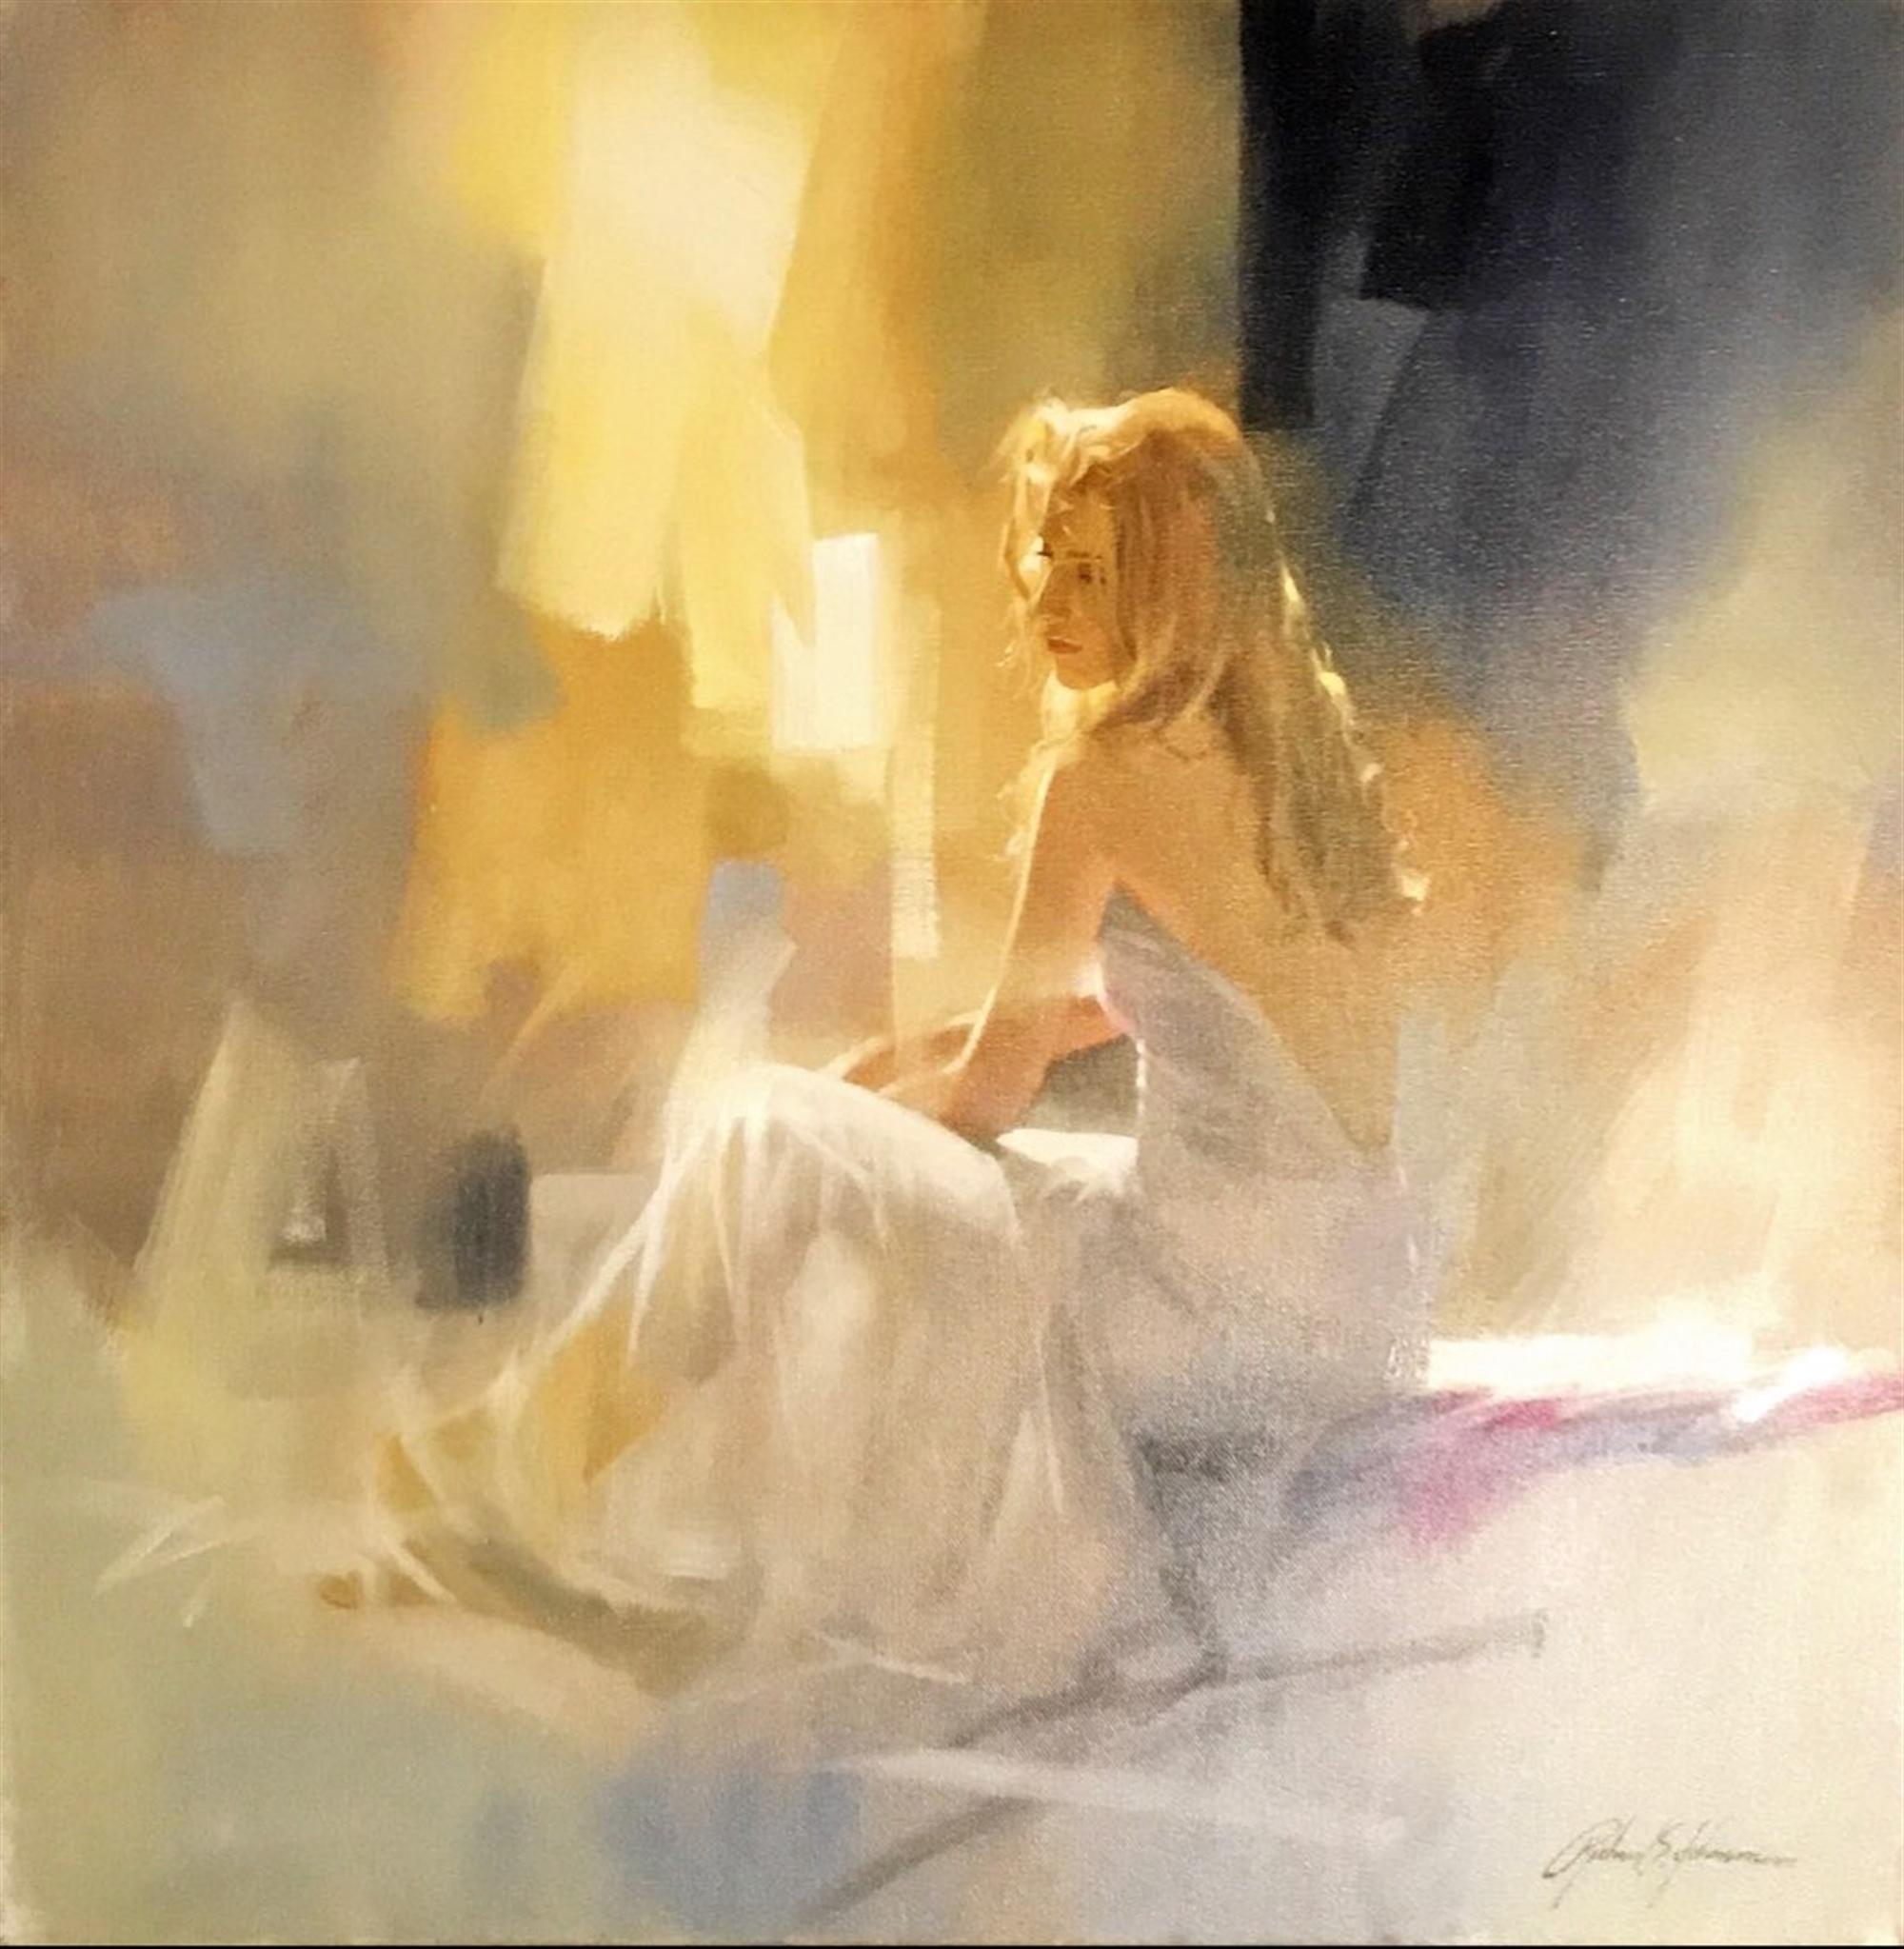 Contemplation by Richard Johnson